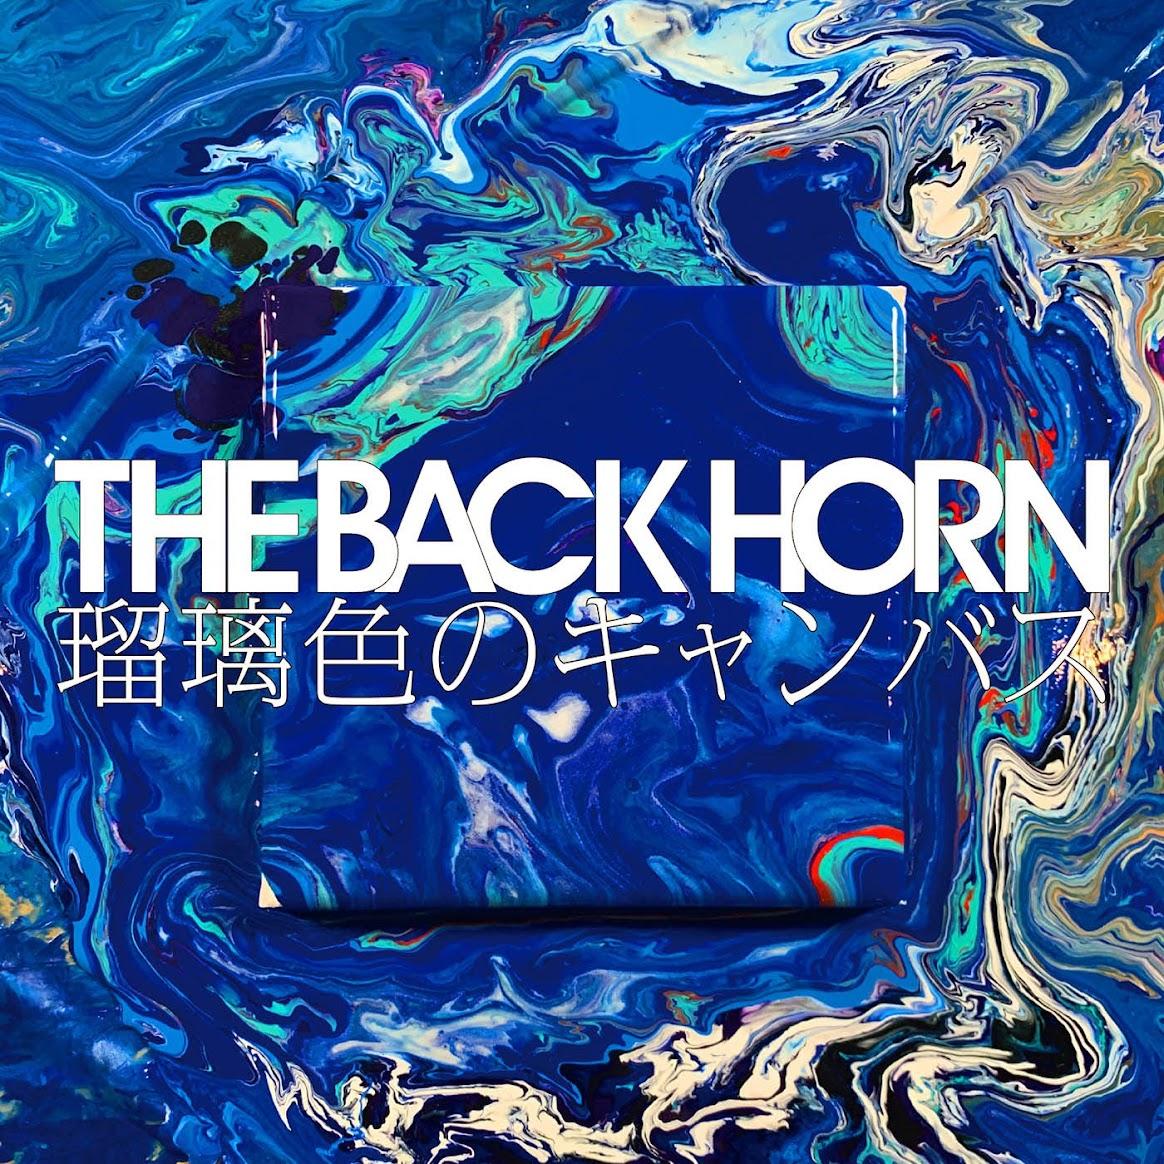 THE BACK HORN  爆轟樂團 推新曲《琉璃色的畫布》 「只要有音樂相伴,就能一再改變重生」